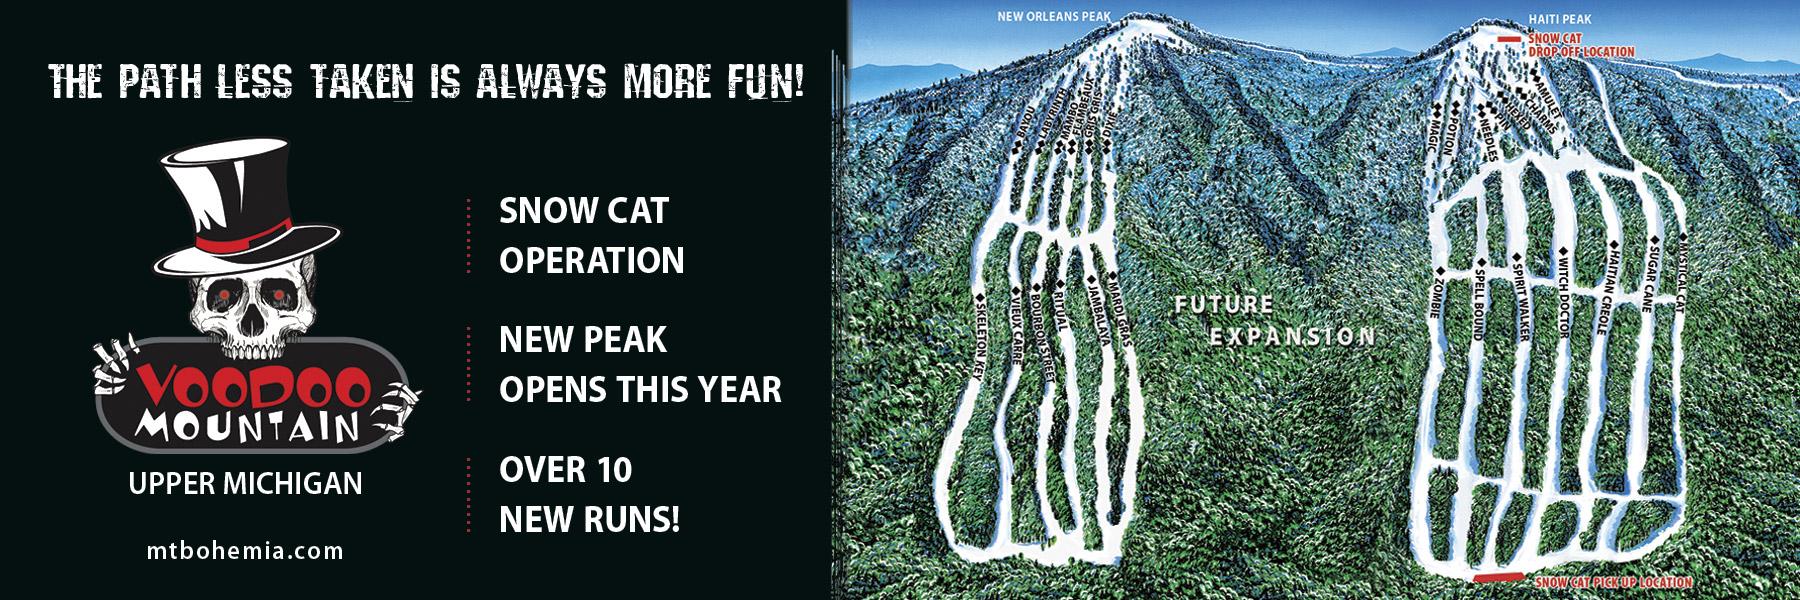 voodoo mountain snow cat skiing